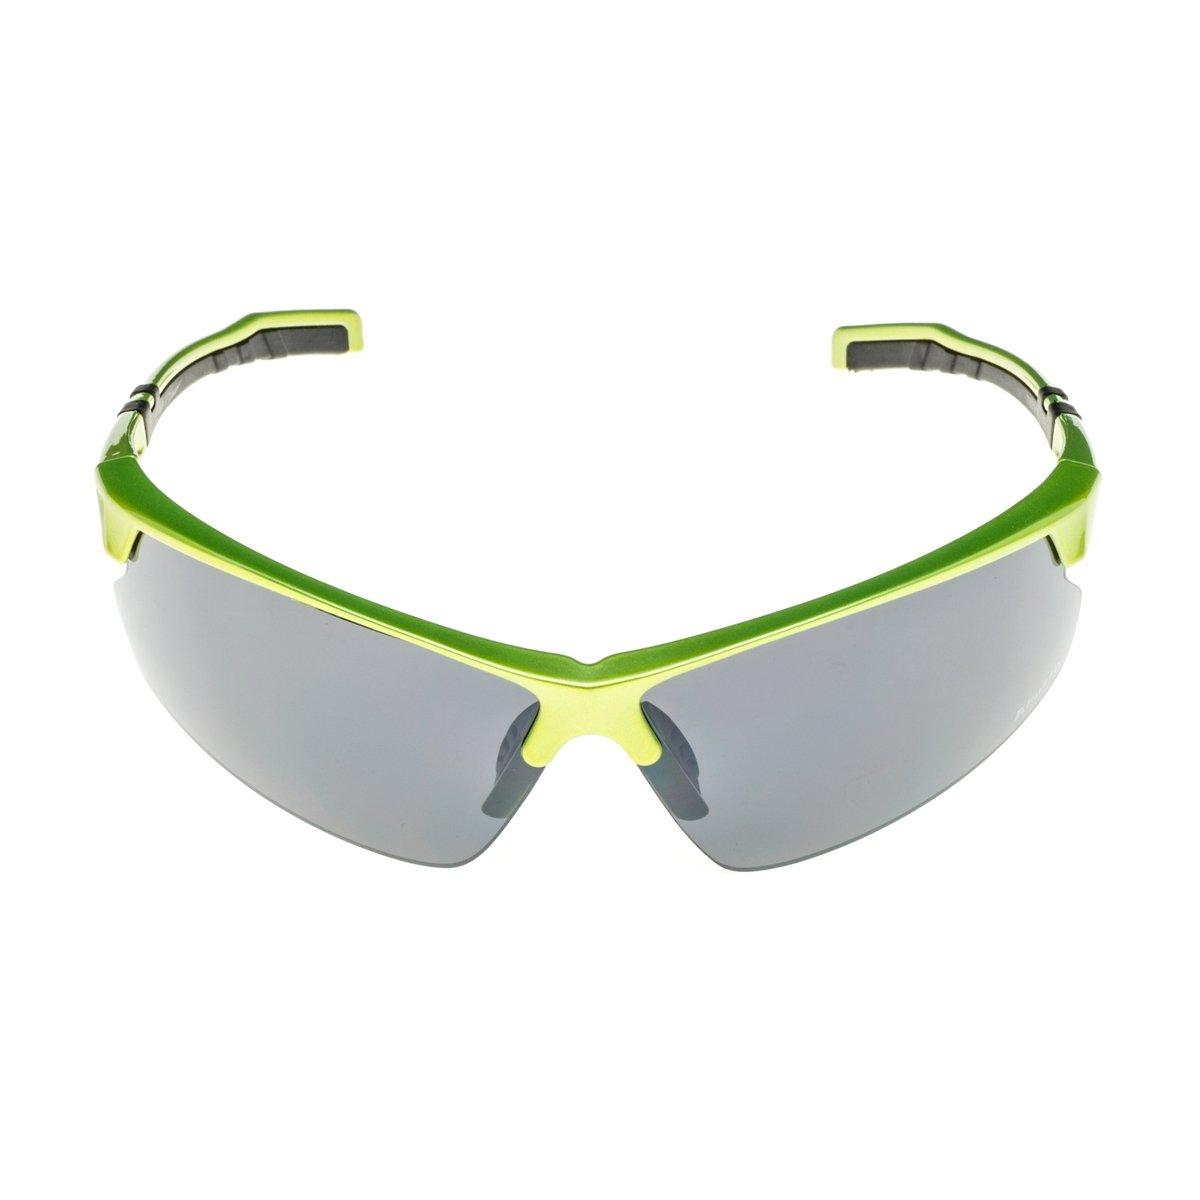 91735e505d340 Óculos de Sol Khatto KTS70050 - Compre Agora   Netshoes